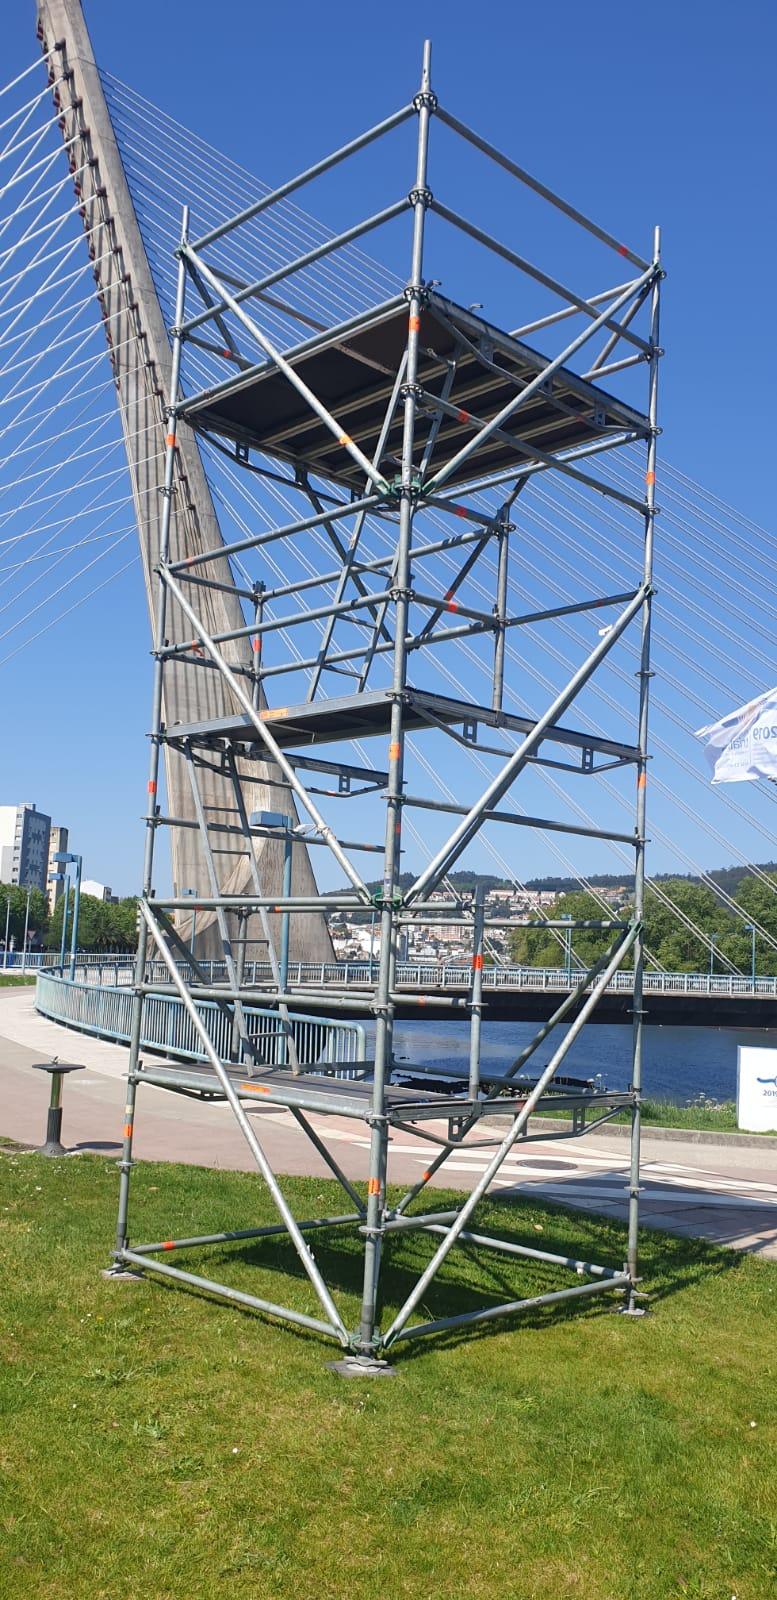 torres-triatlon-pontevedra$-2019